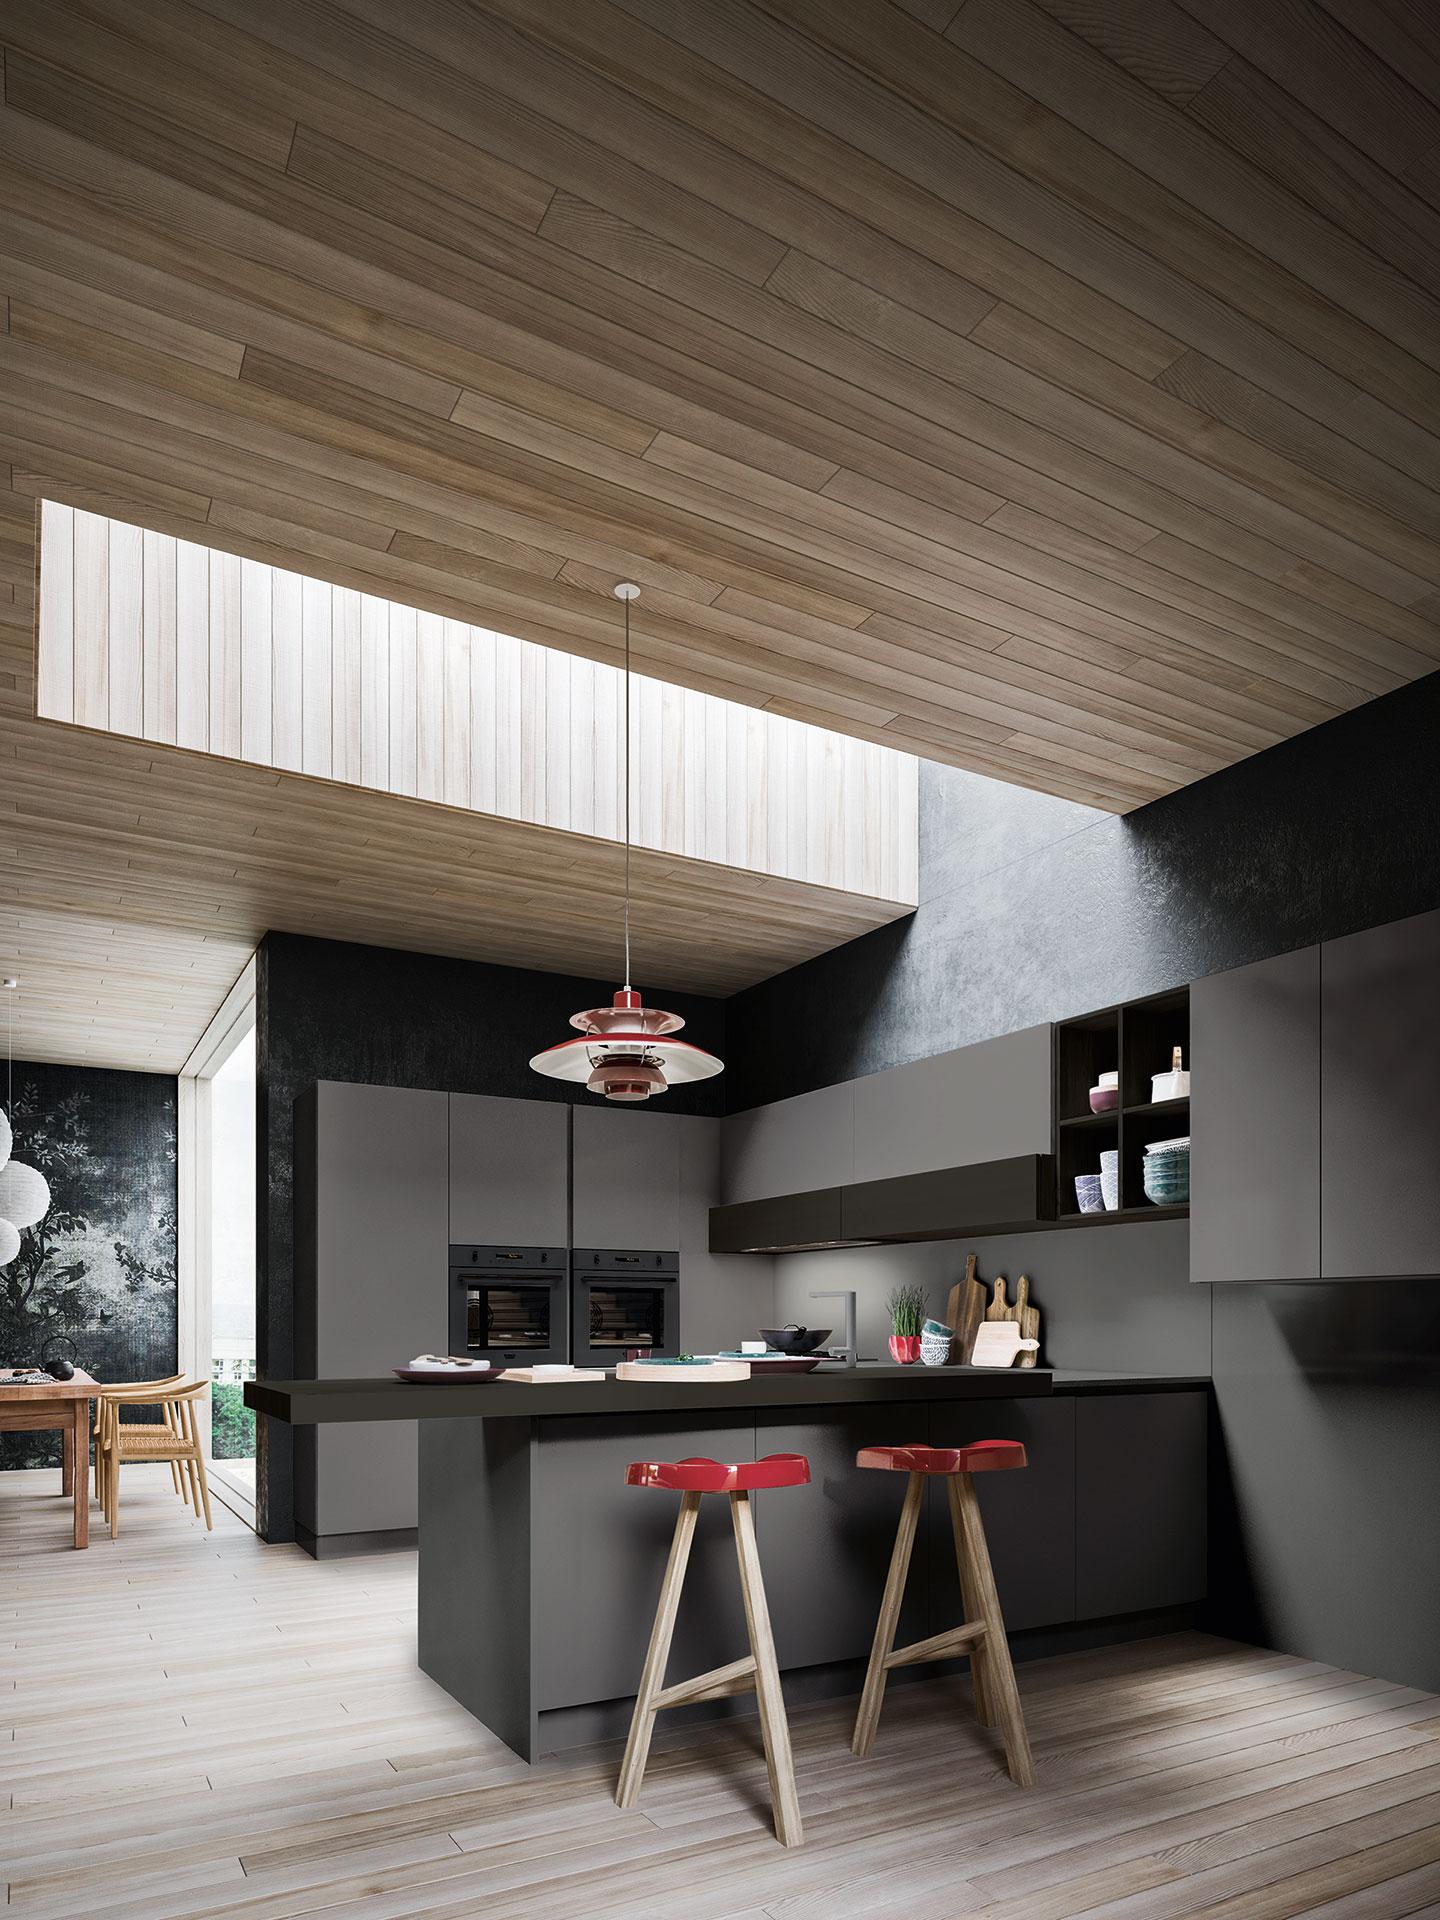 Un design originale per le cucine moderne antares - Cucine originali ...